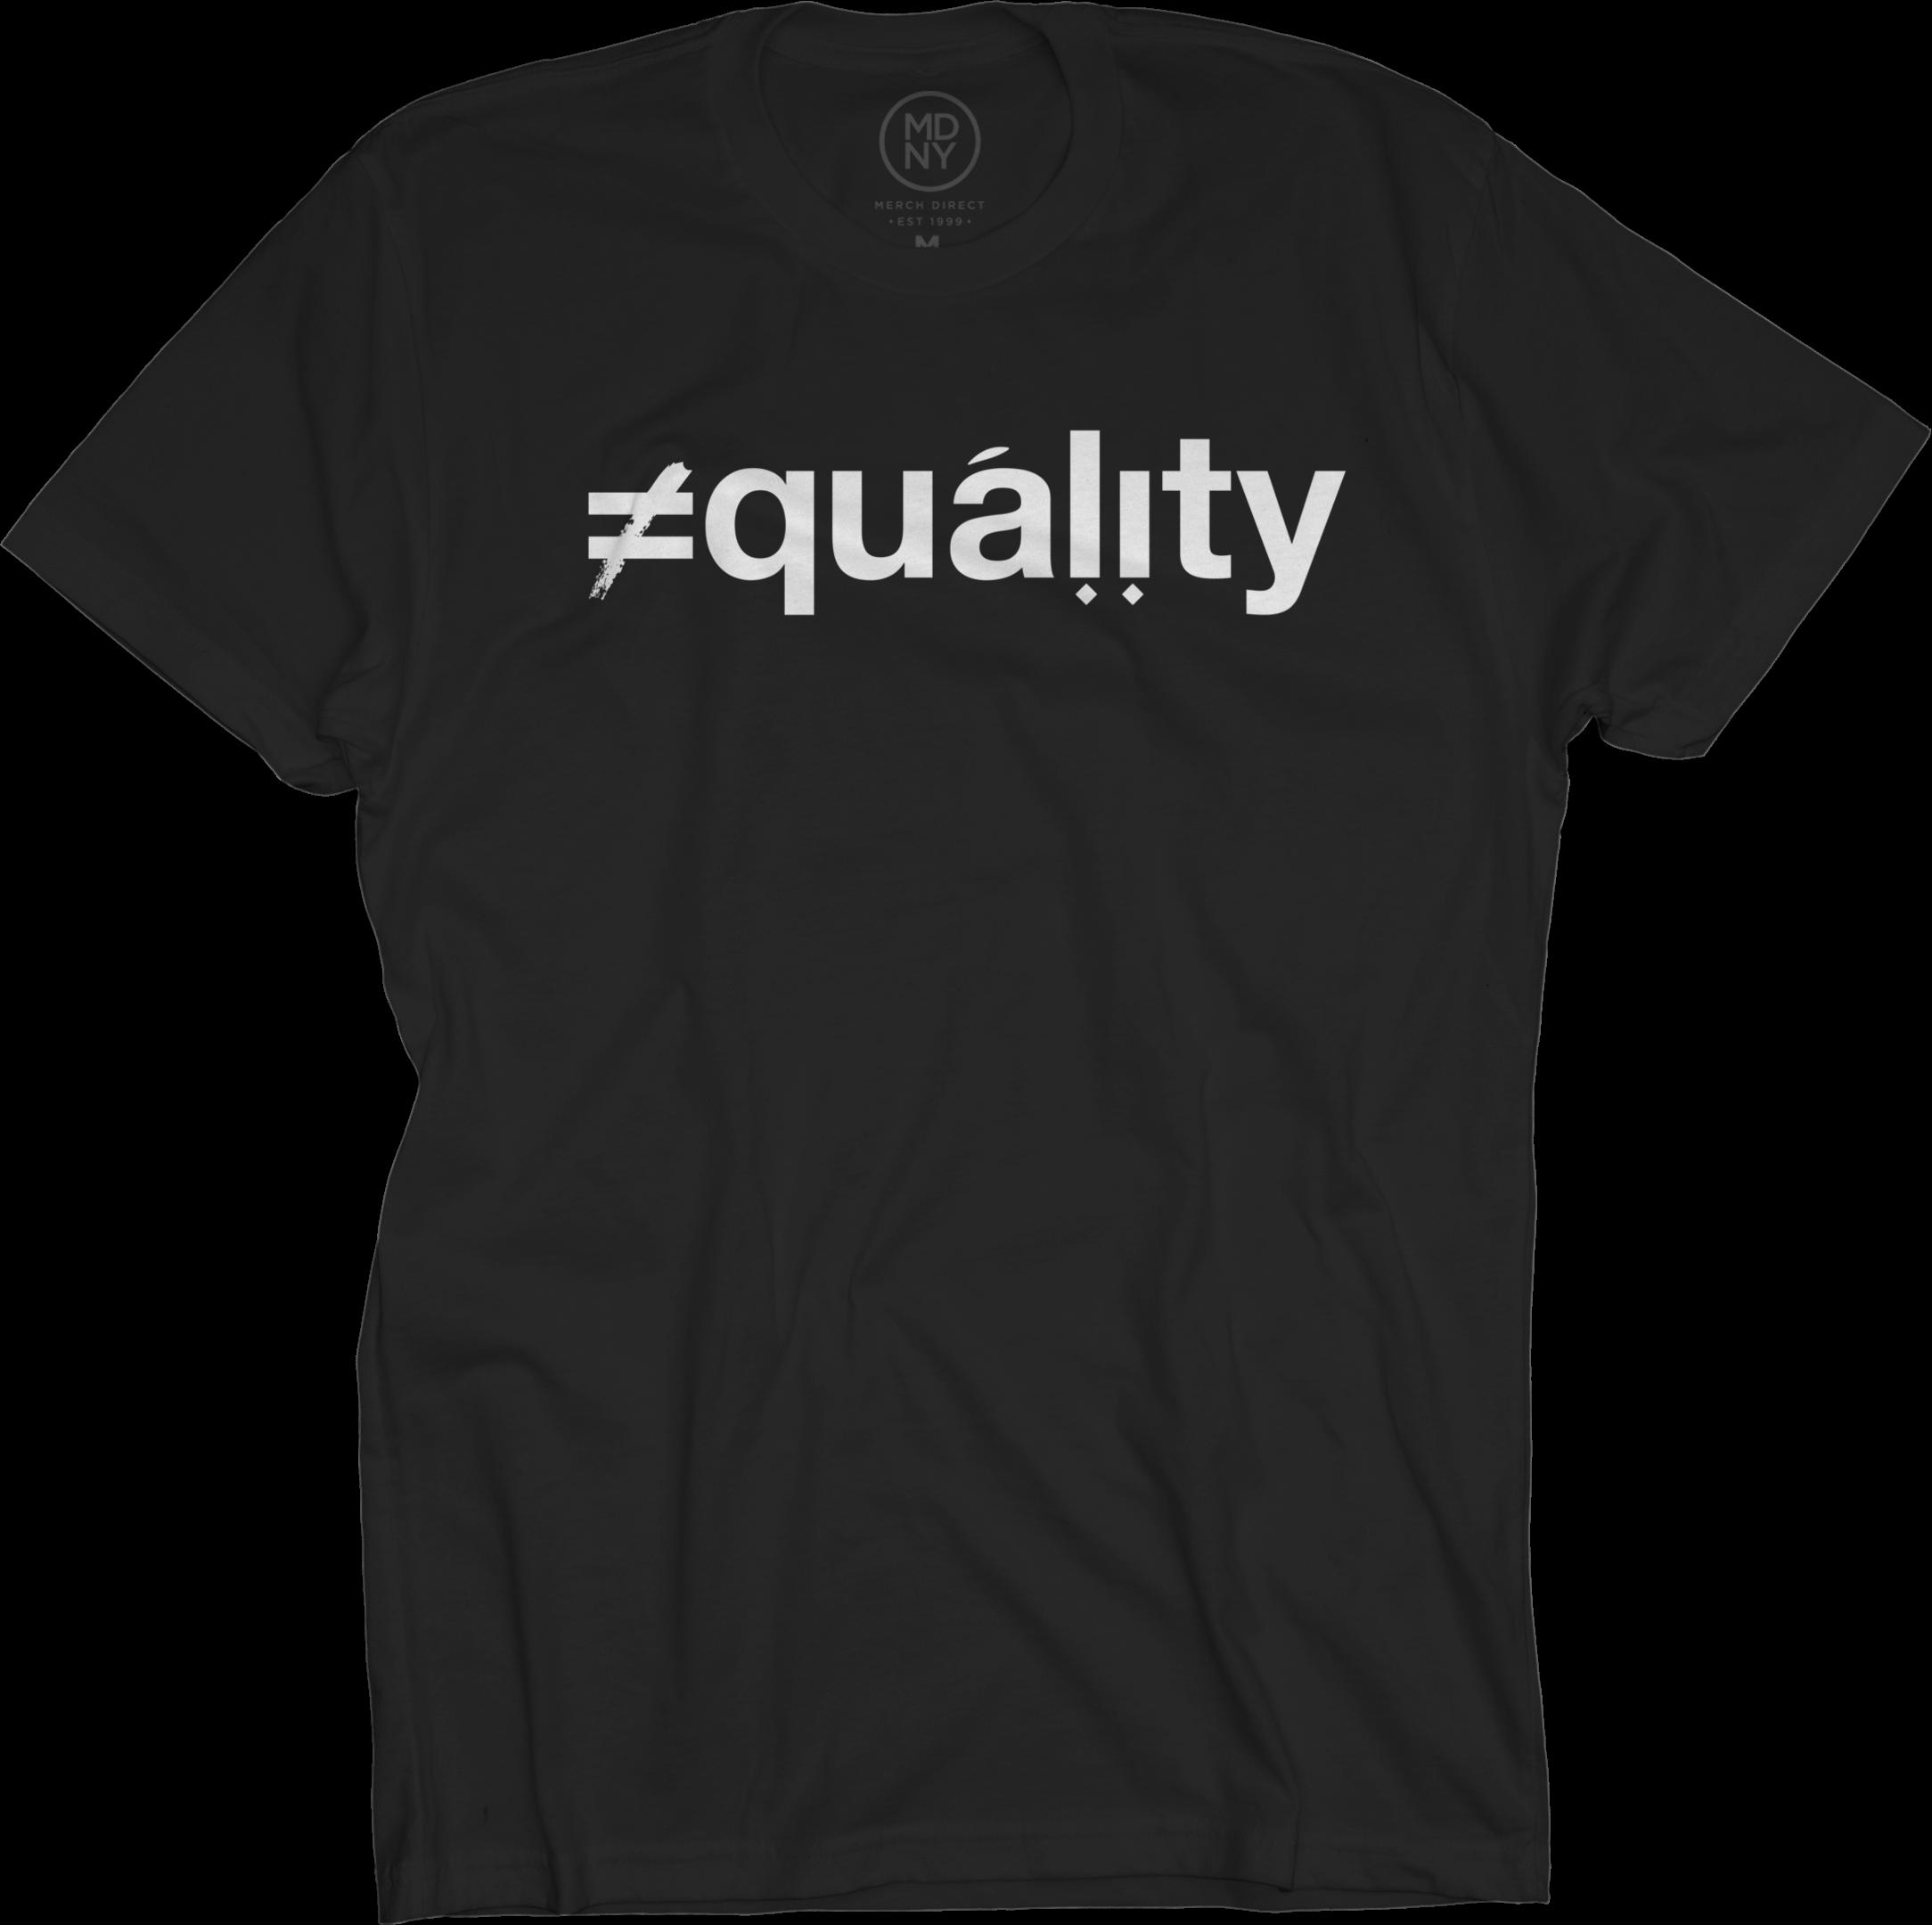 Ali Shaheed - Equality on Black T Shirt d6f63dfbd